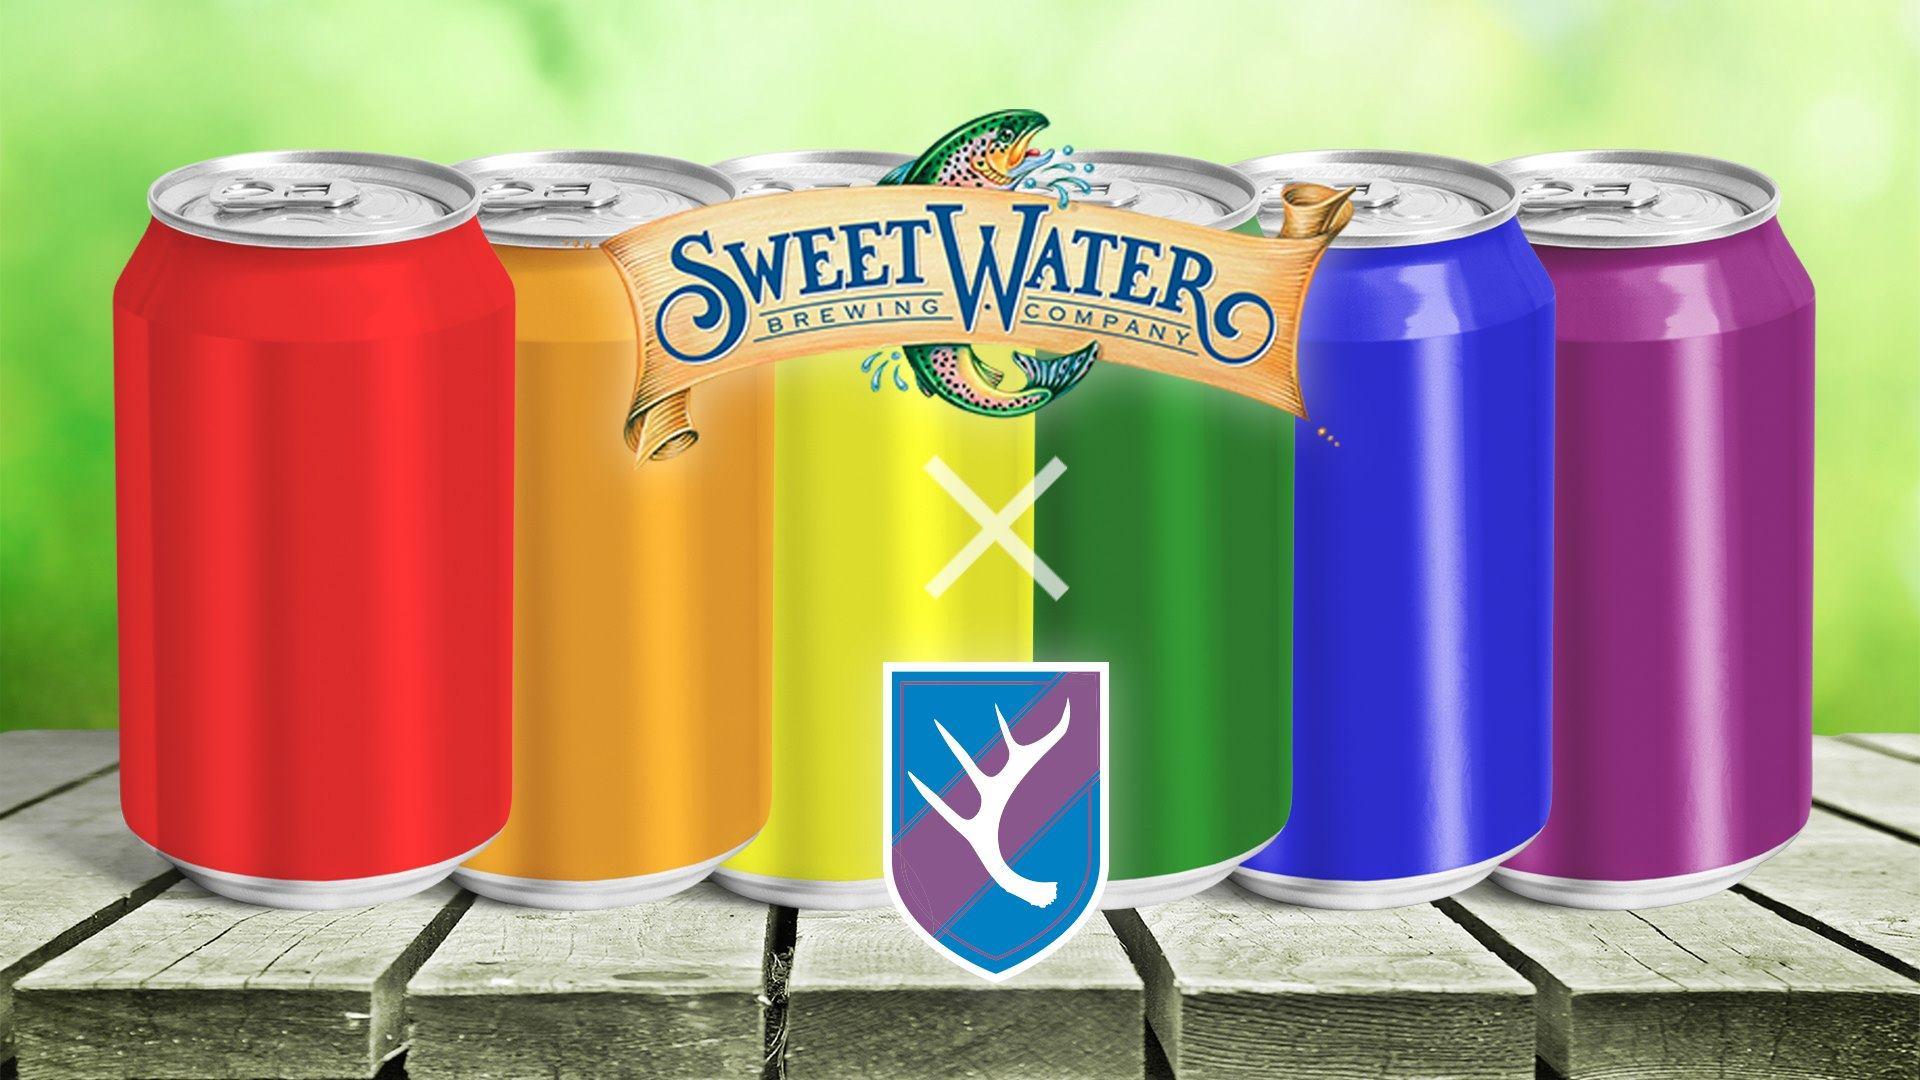 sweetwater download.jpg